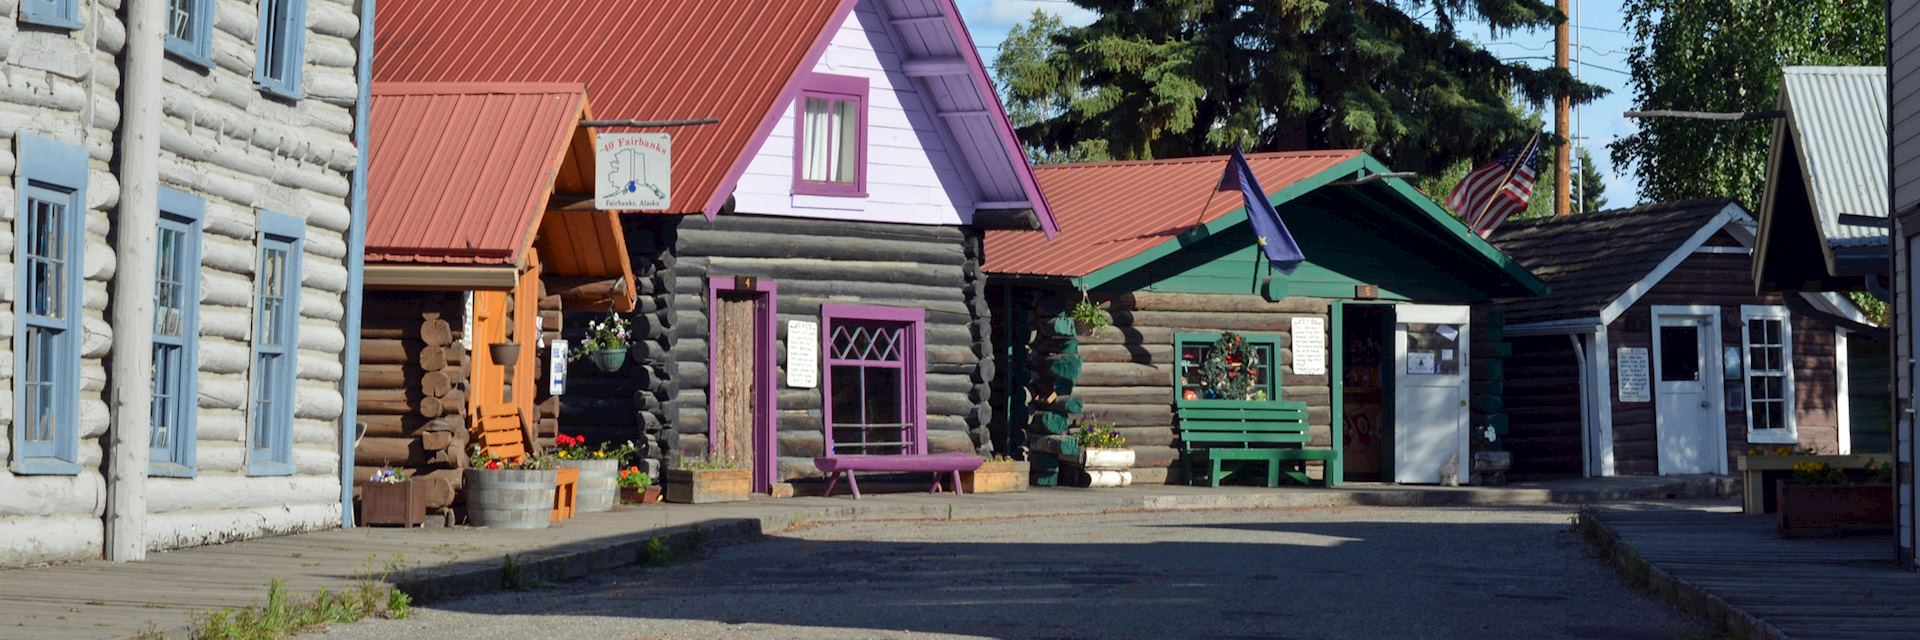 Fairbanks in Alaska